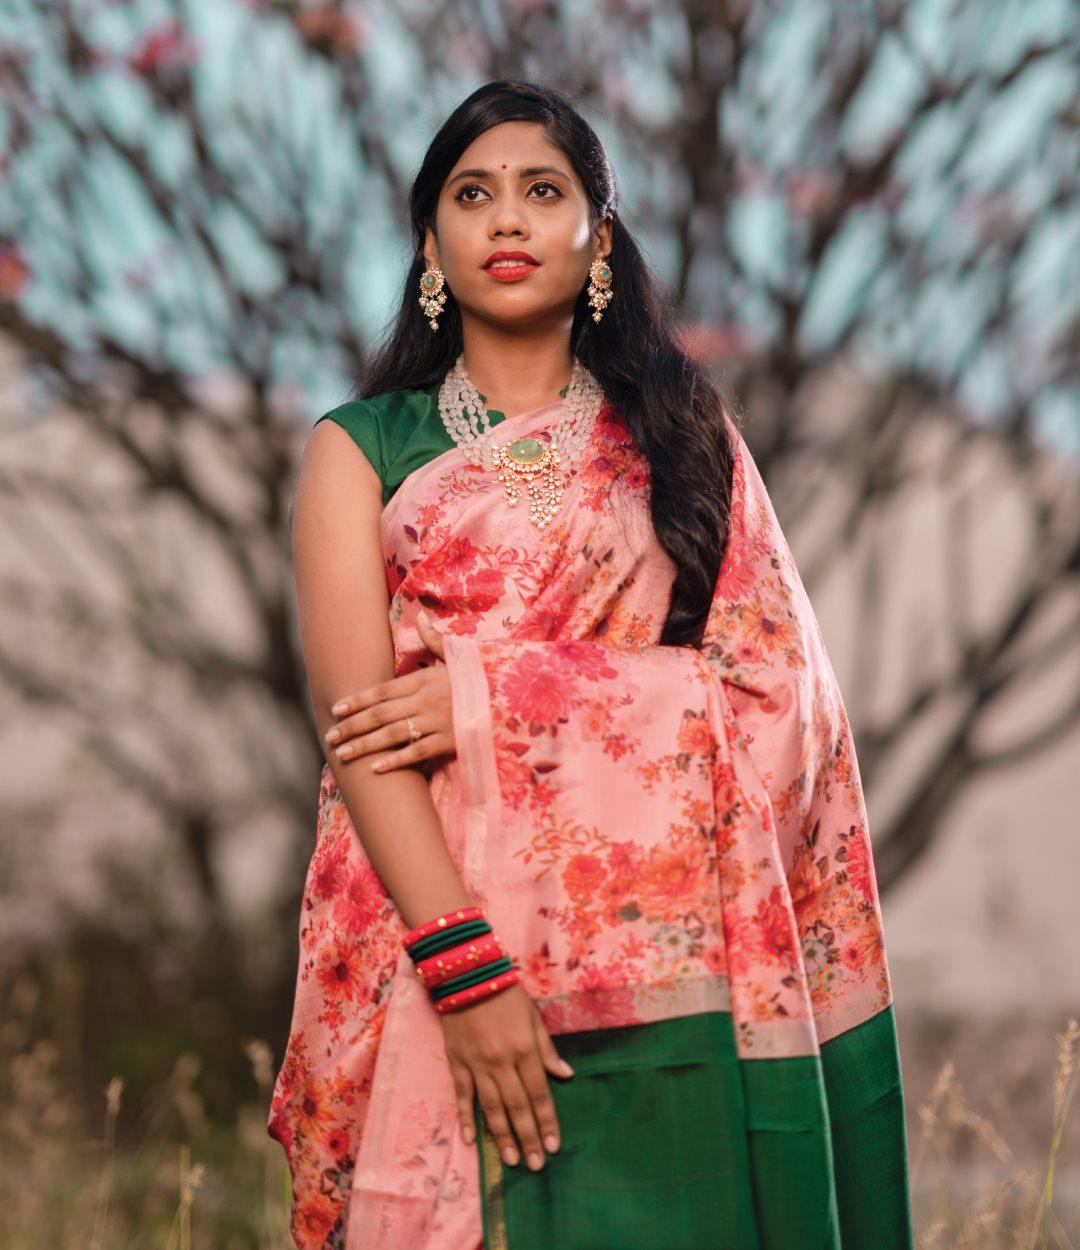 A gorgeous pastel pink floral printed Kanchi silk saree with emerald green pallu. Printed elegance - Our collection of gorgeous printed Kanchi silk sarees! 2021-04-09